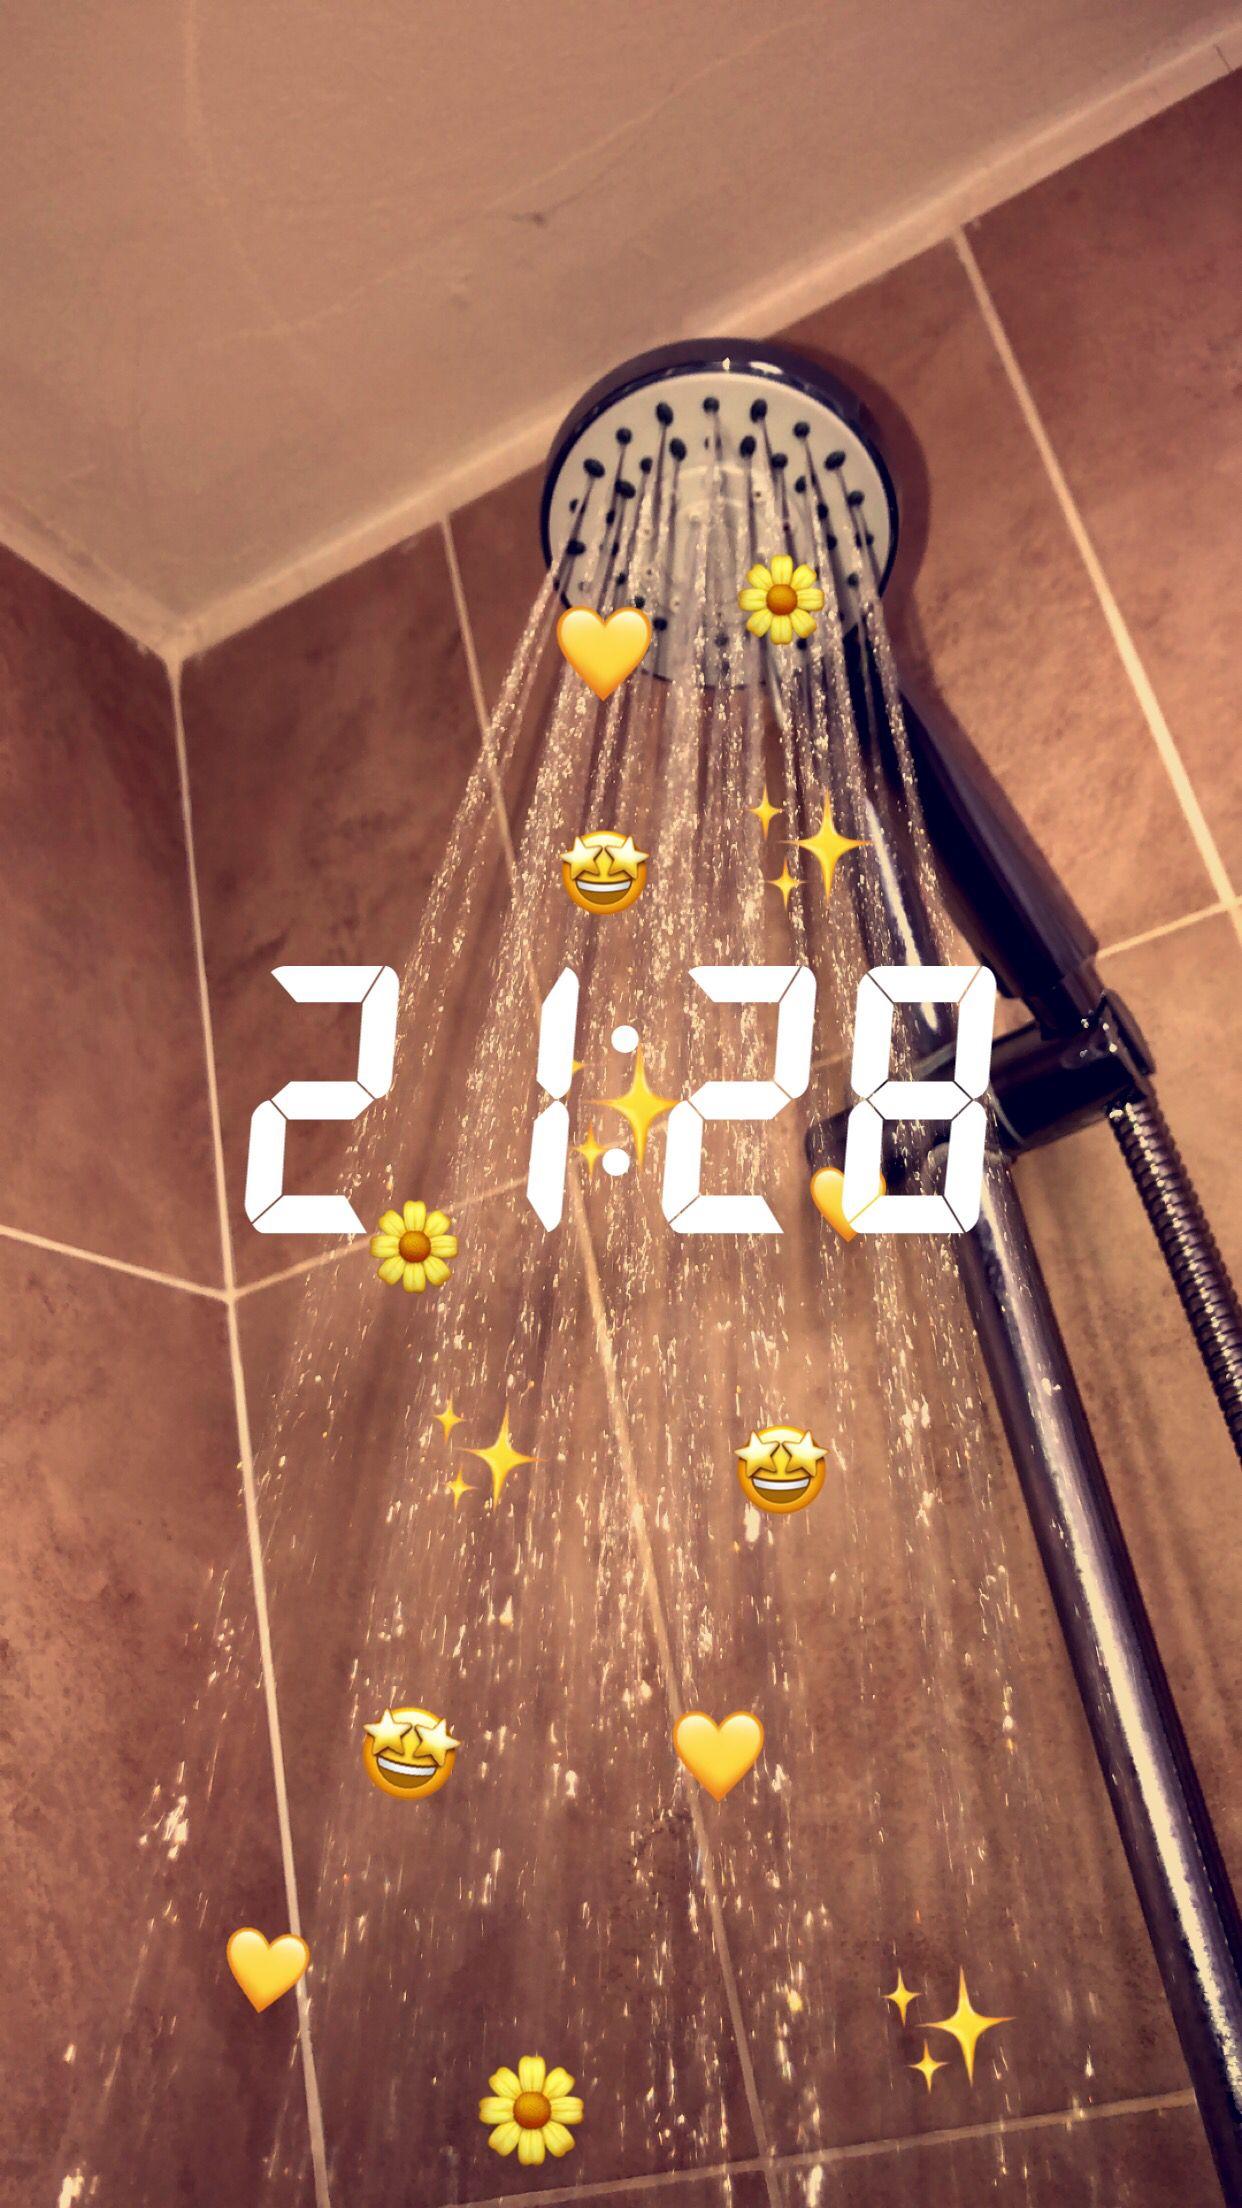 showers streaks snapchat aesthetic in 2020 Snapchat